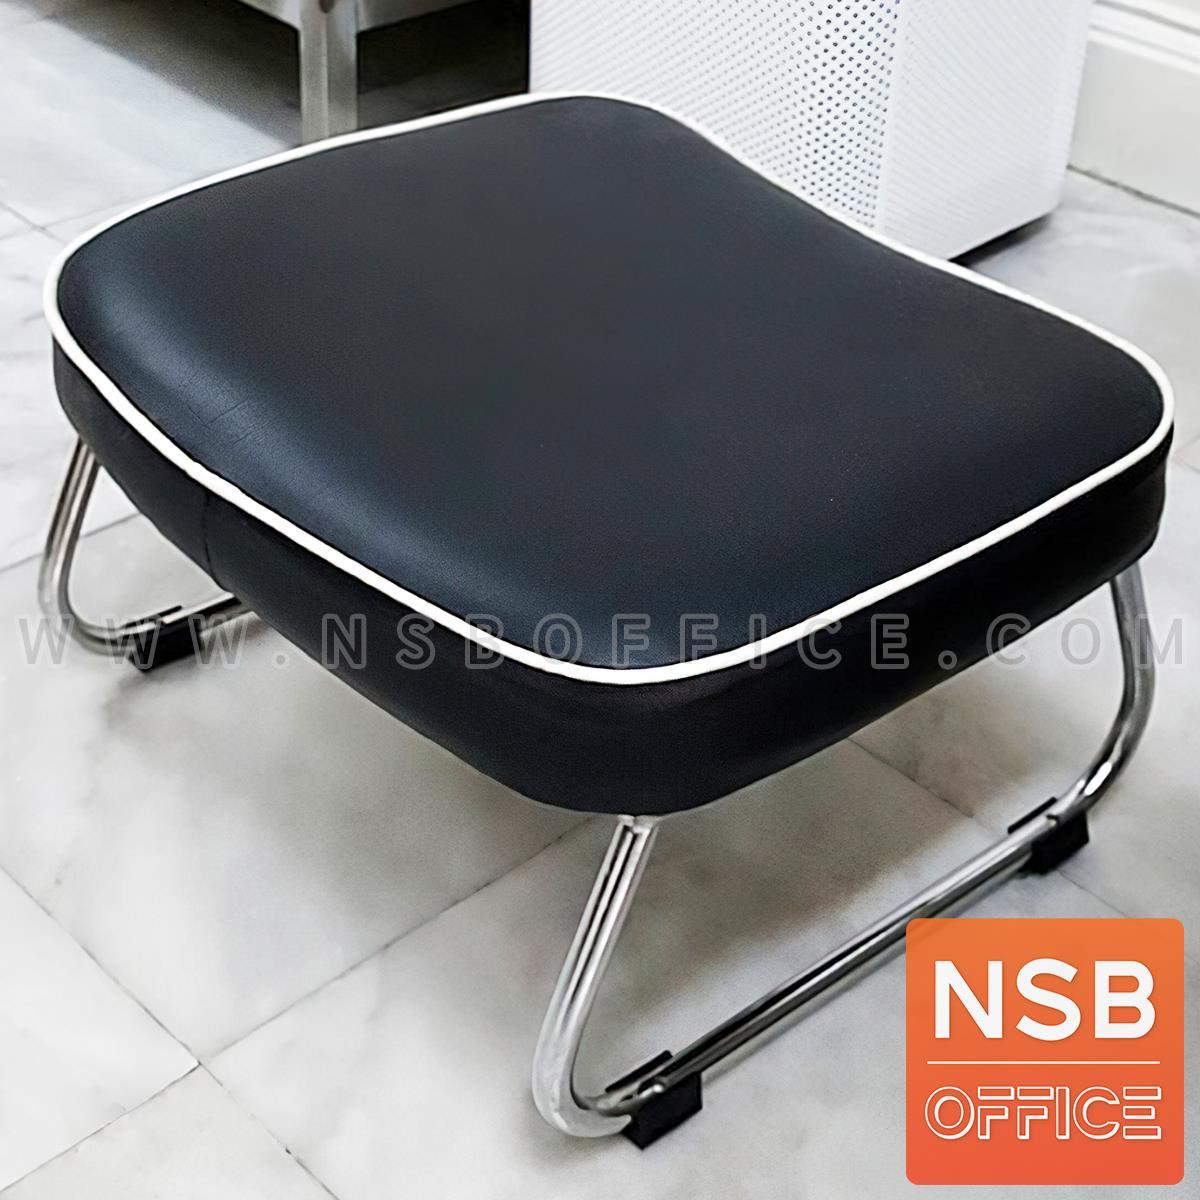 B15A070:เก้าอี้ช่างทำเล็บ รุ่น Loxie (ล็อกซี่)  ขาเหล็กชุบโครเมี่ยม